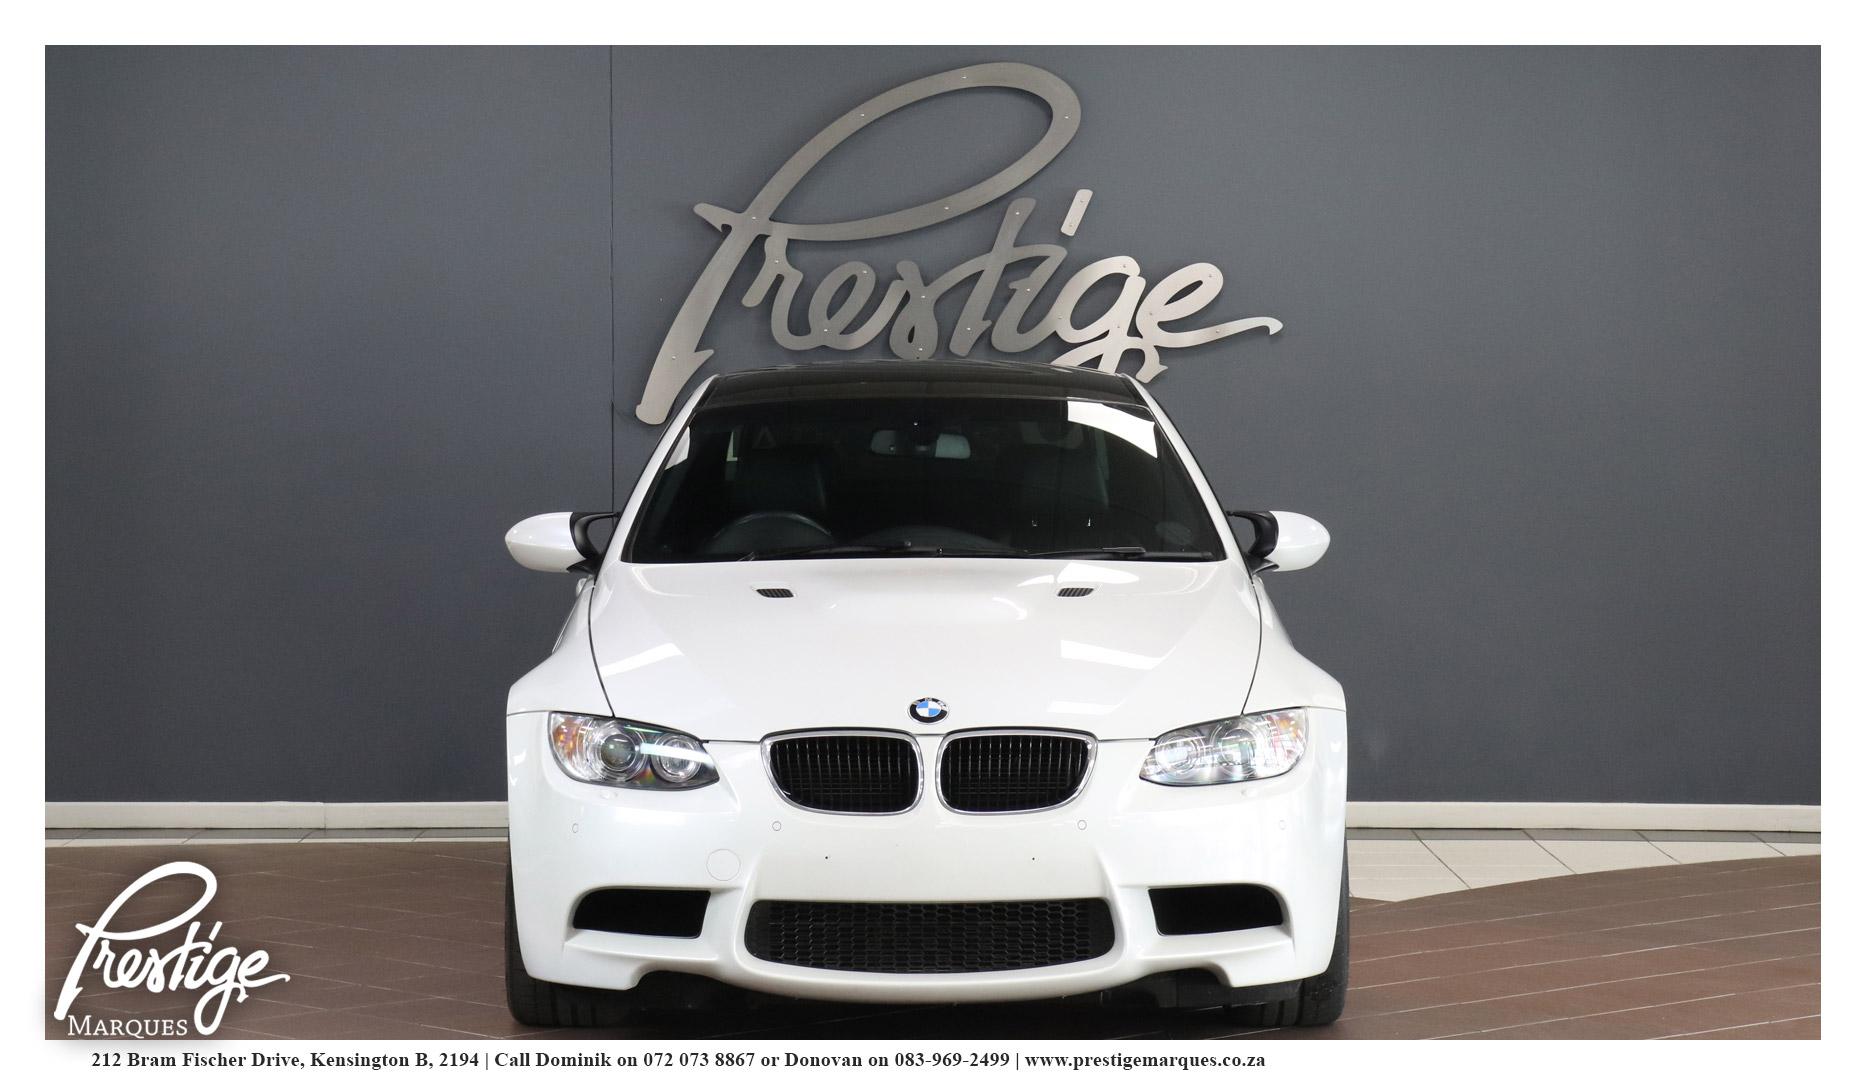 2011-BMW-E92-M3-MDCT-Competition-Package-Prestige-Marques-Randburg-Sandton-8